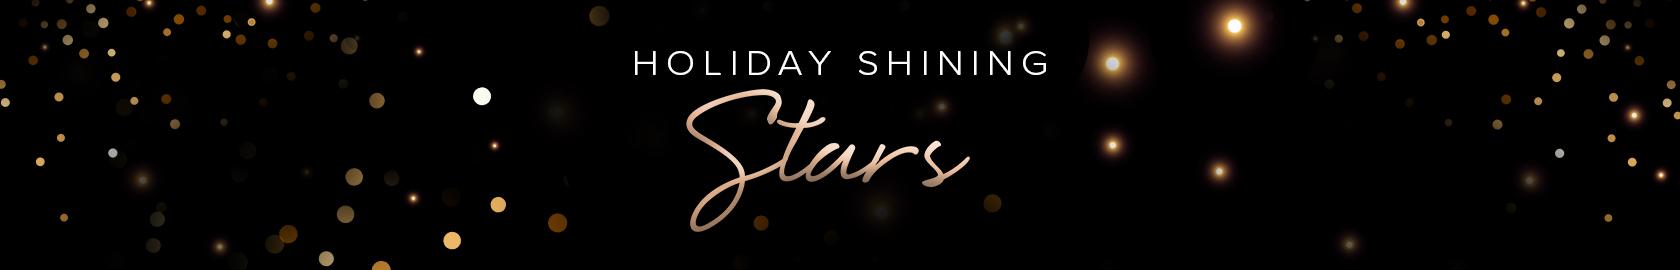 Gift Guide Shining Stars